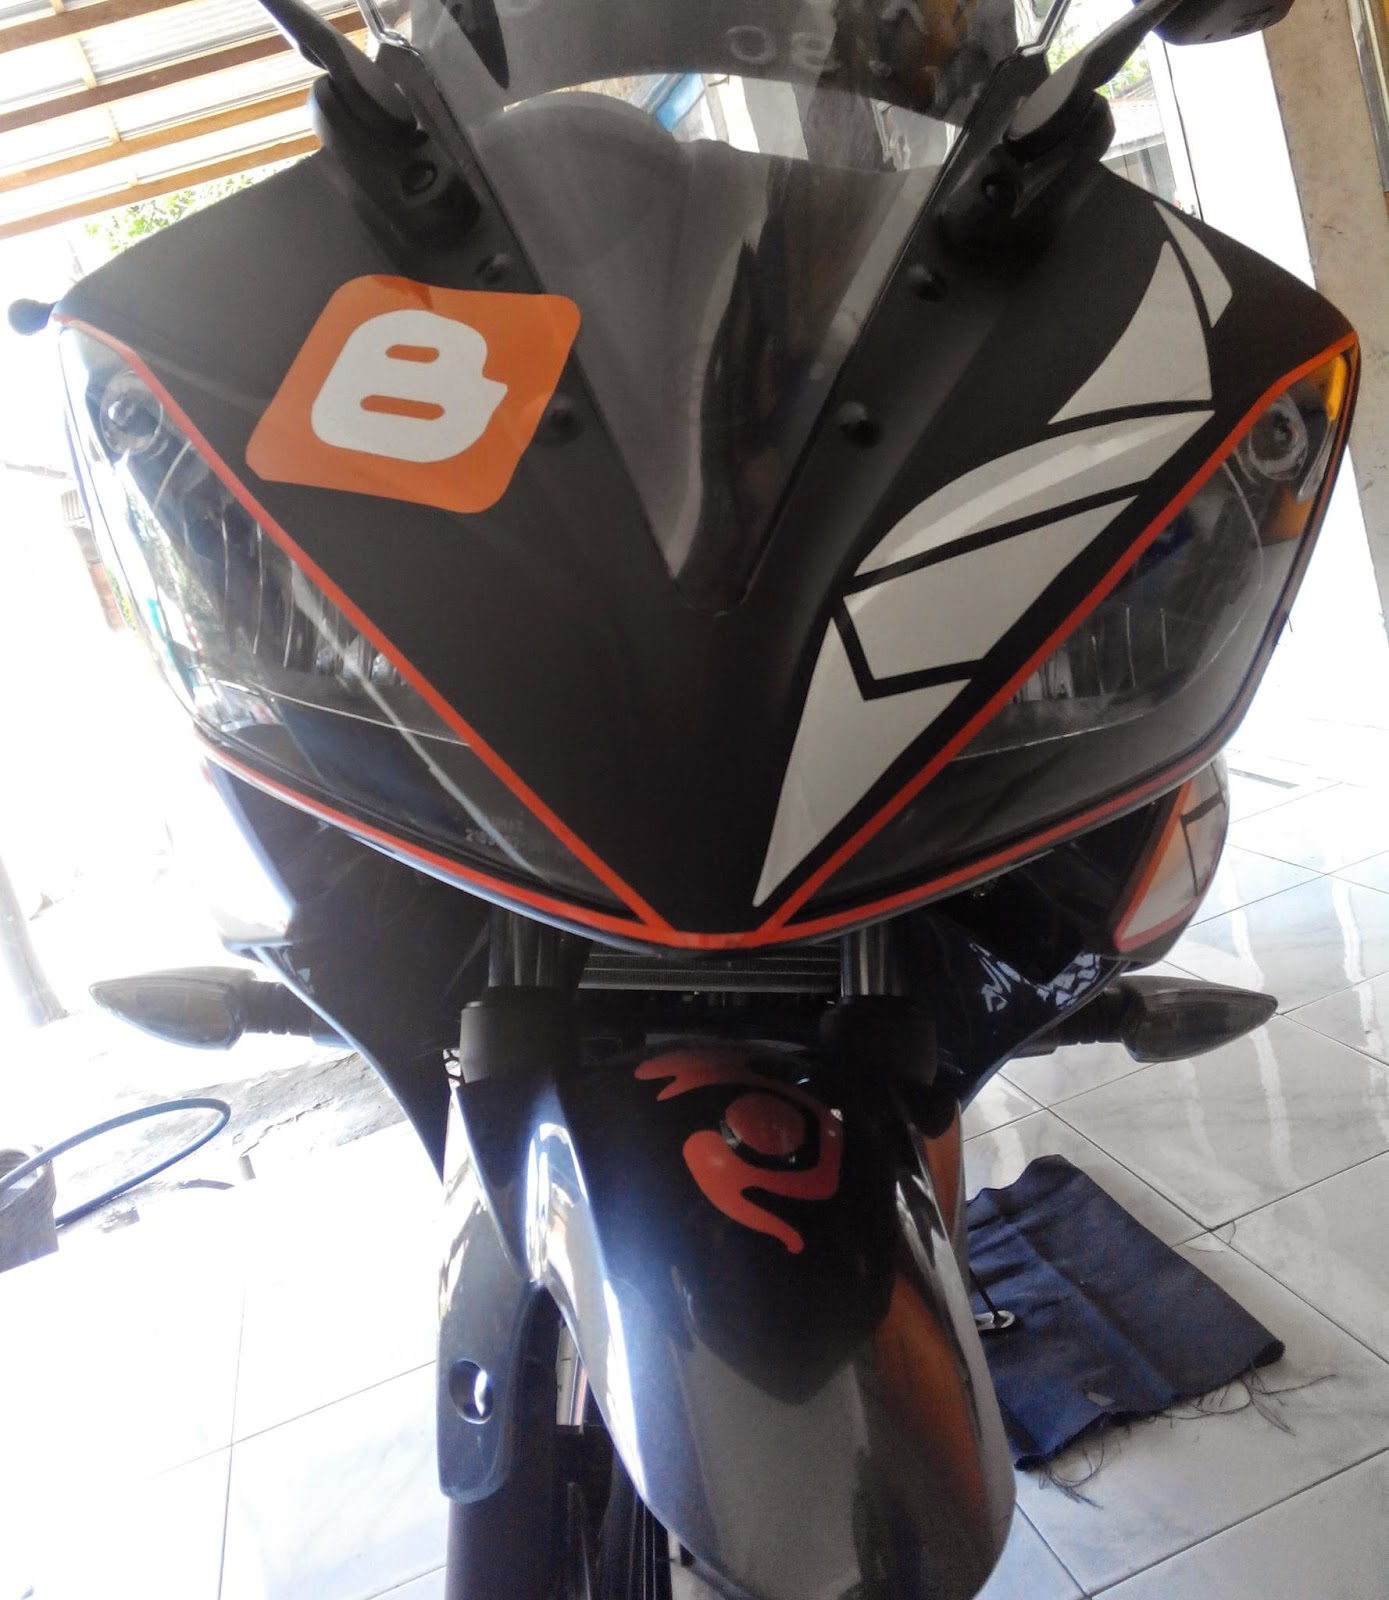 Motor Drag Ninja Modifkasi Lampu Atau Mata R15 V2 Yamaha 2014